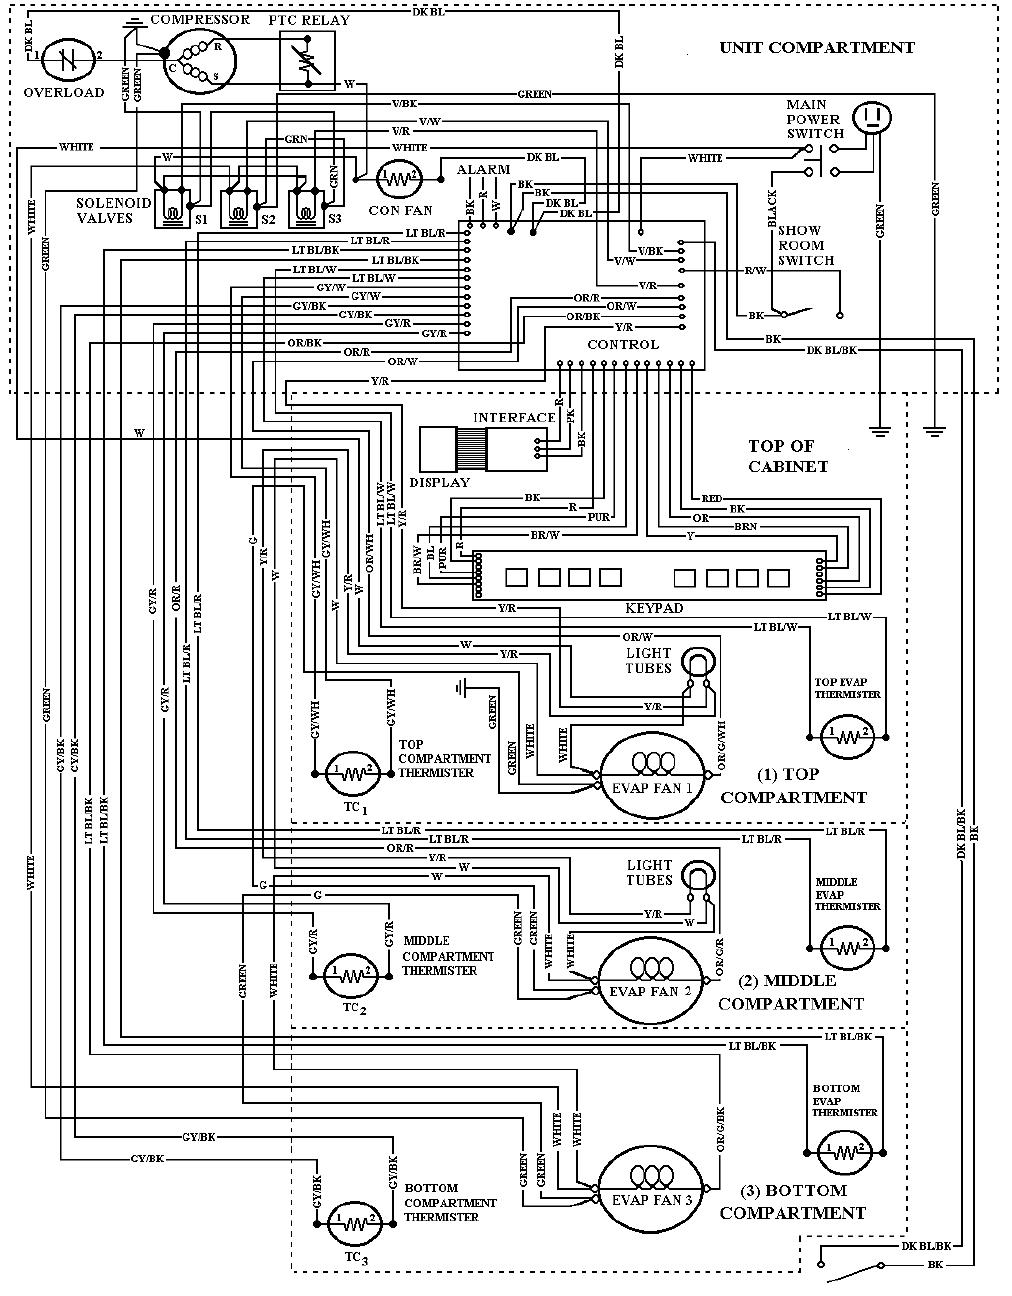 [DIAGRAM_38IS]  Viking Vcwb300 Users Manual SERVICE NOTEBOOK | Viking Solenoid Wiring Diagram |  | UserManual.wiki